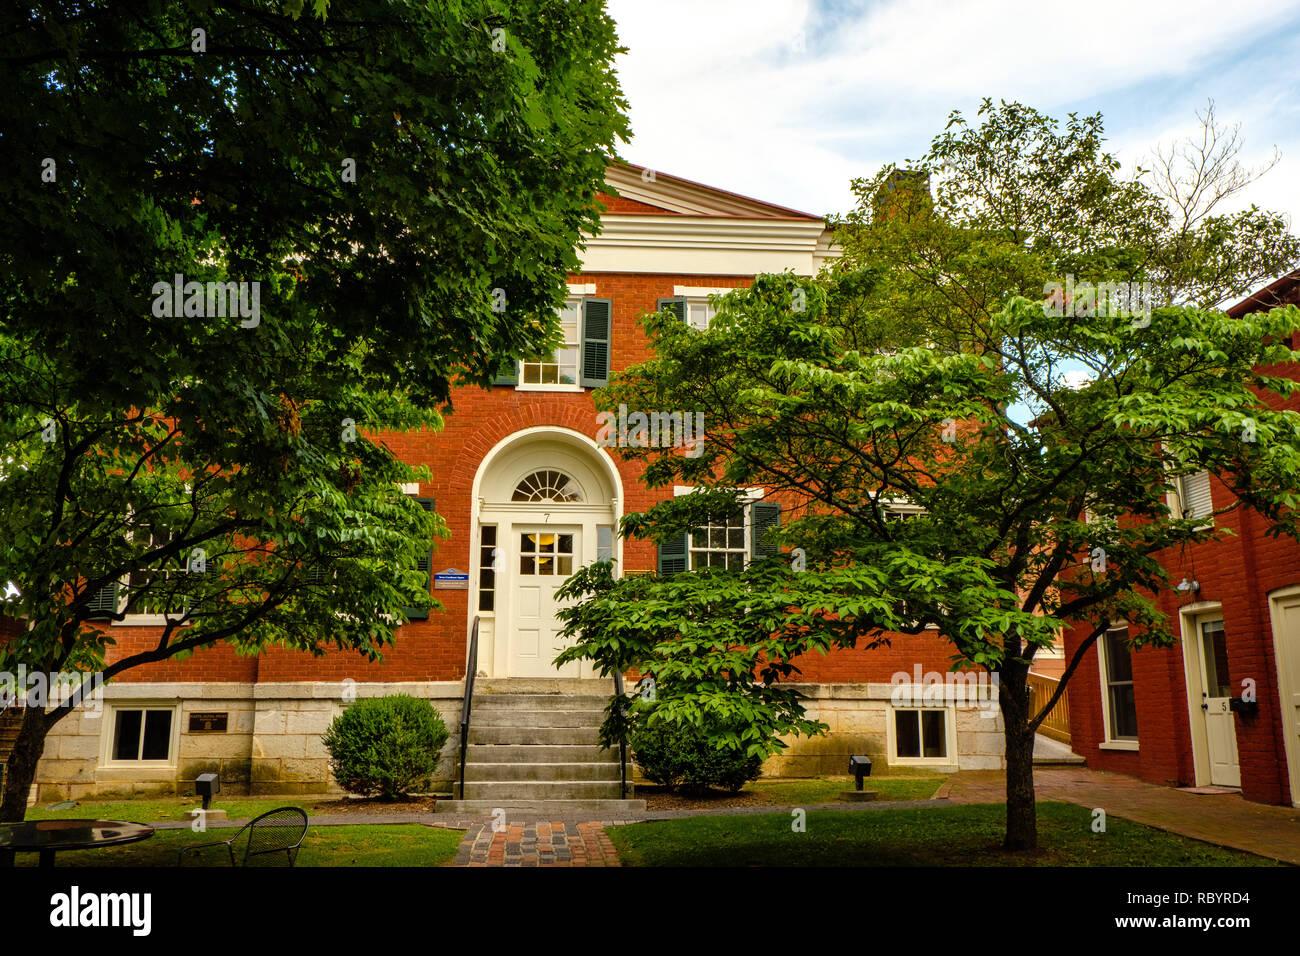 Former Rockbridge County Jail, Courthouse Square, Lexington, Virginia - Stock Image